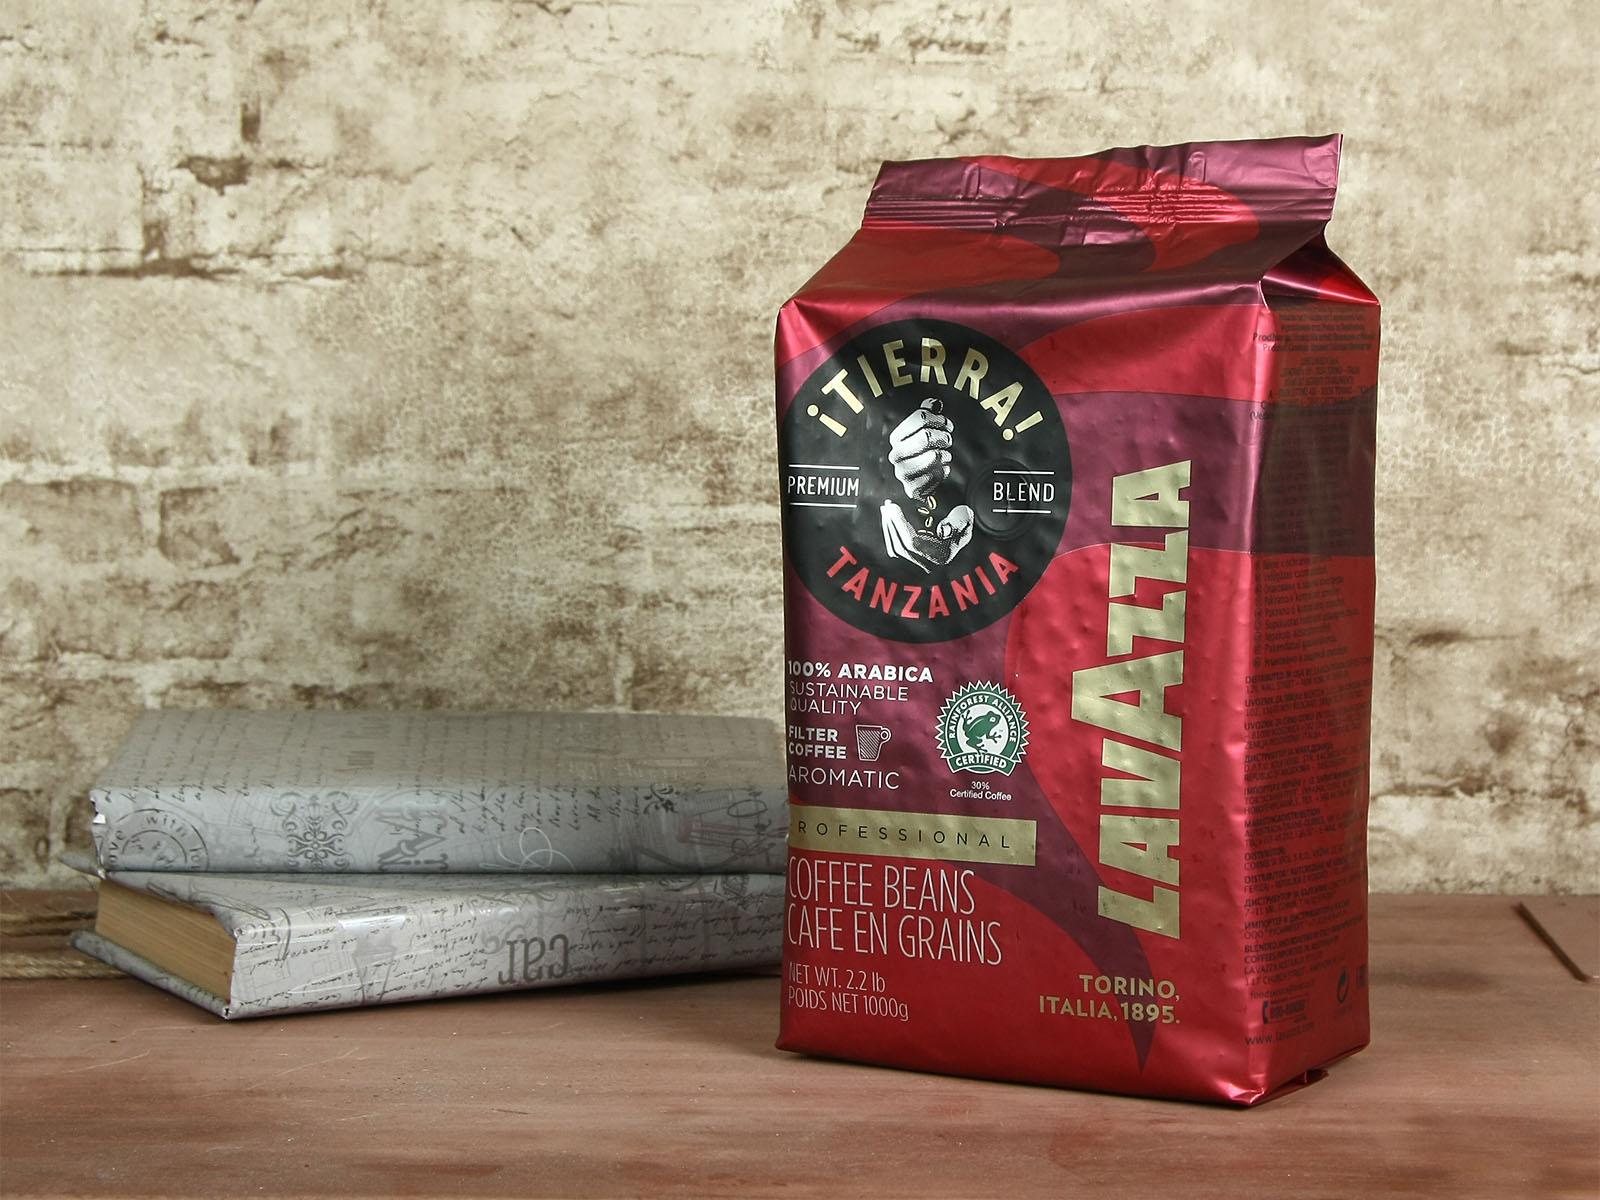 Кофе в зернах Tierra Tanzania Blend Aromatic Arabica 100%, 1000г., арабика